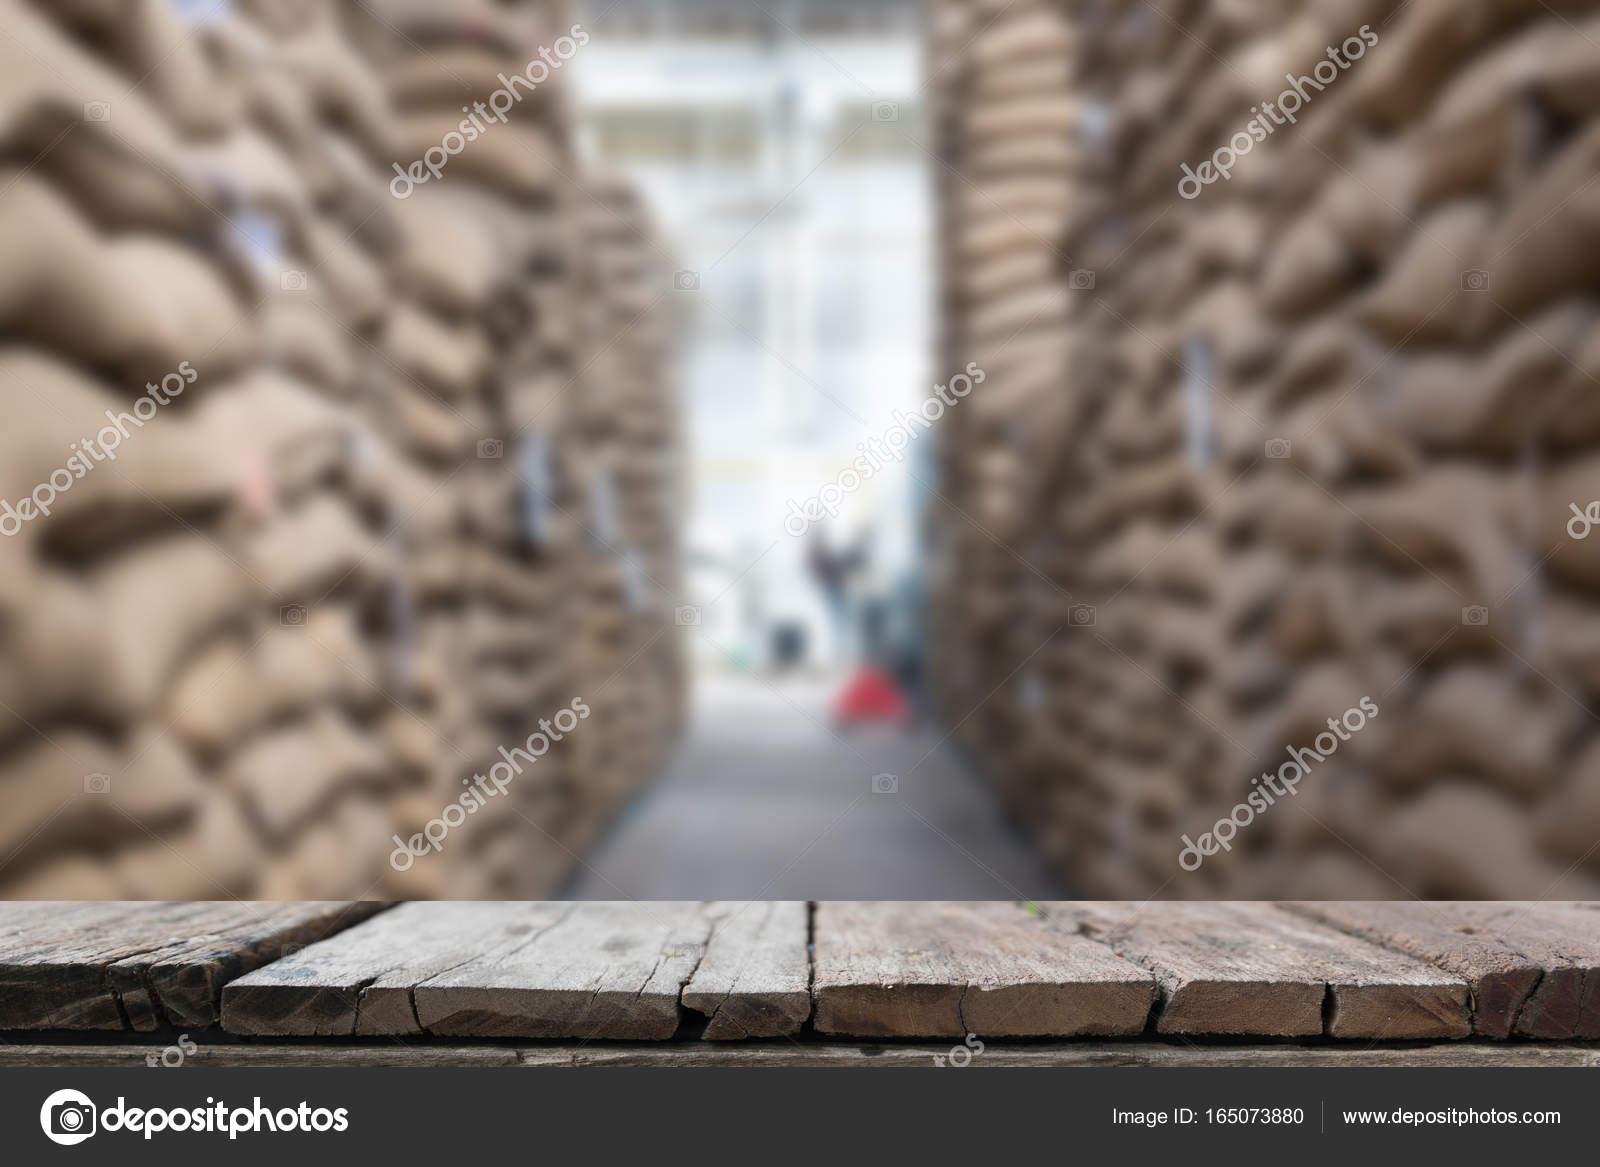 1b20e5d86 Viejo cáñamo sacos con café en grano en almacén. los sacos apilados en  almacén con mesa de madera para mostrar su producto — Foto de ...